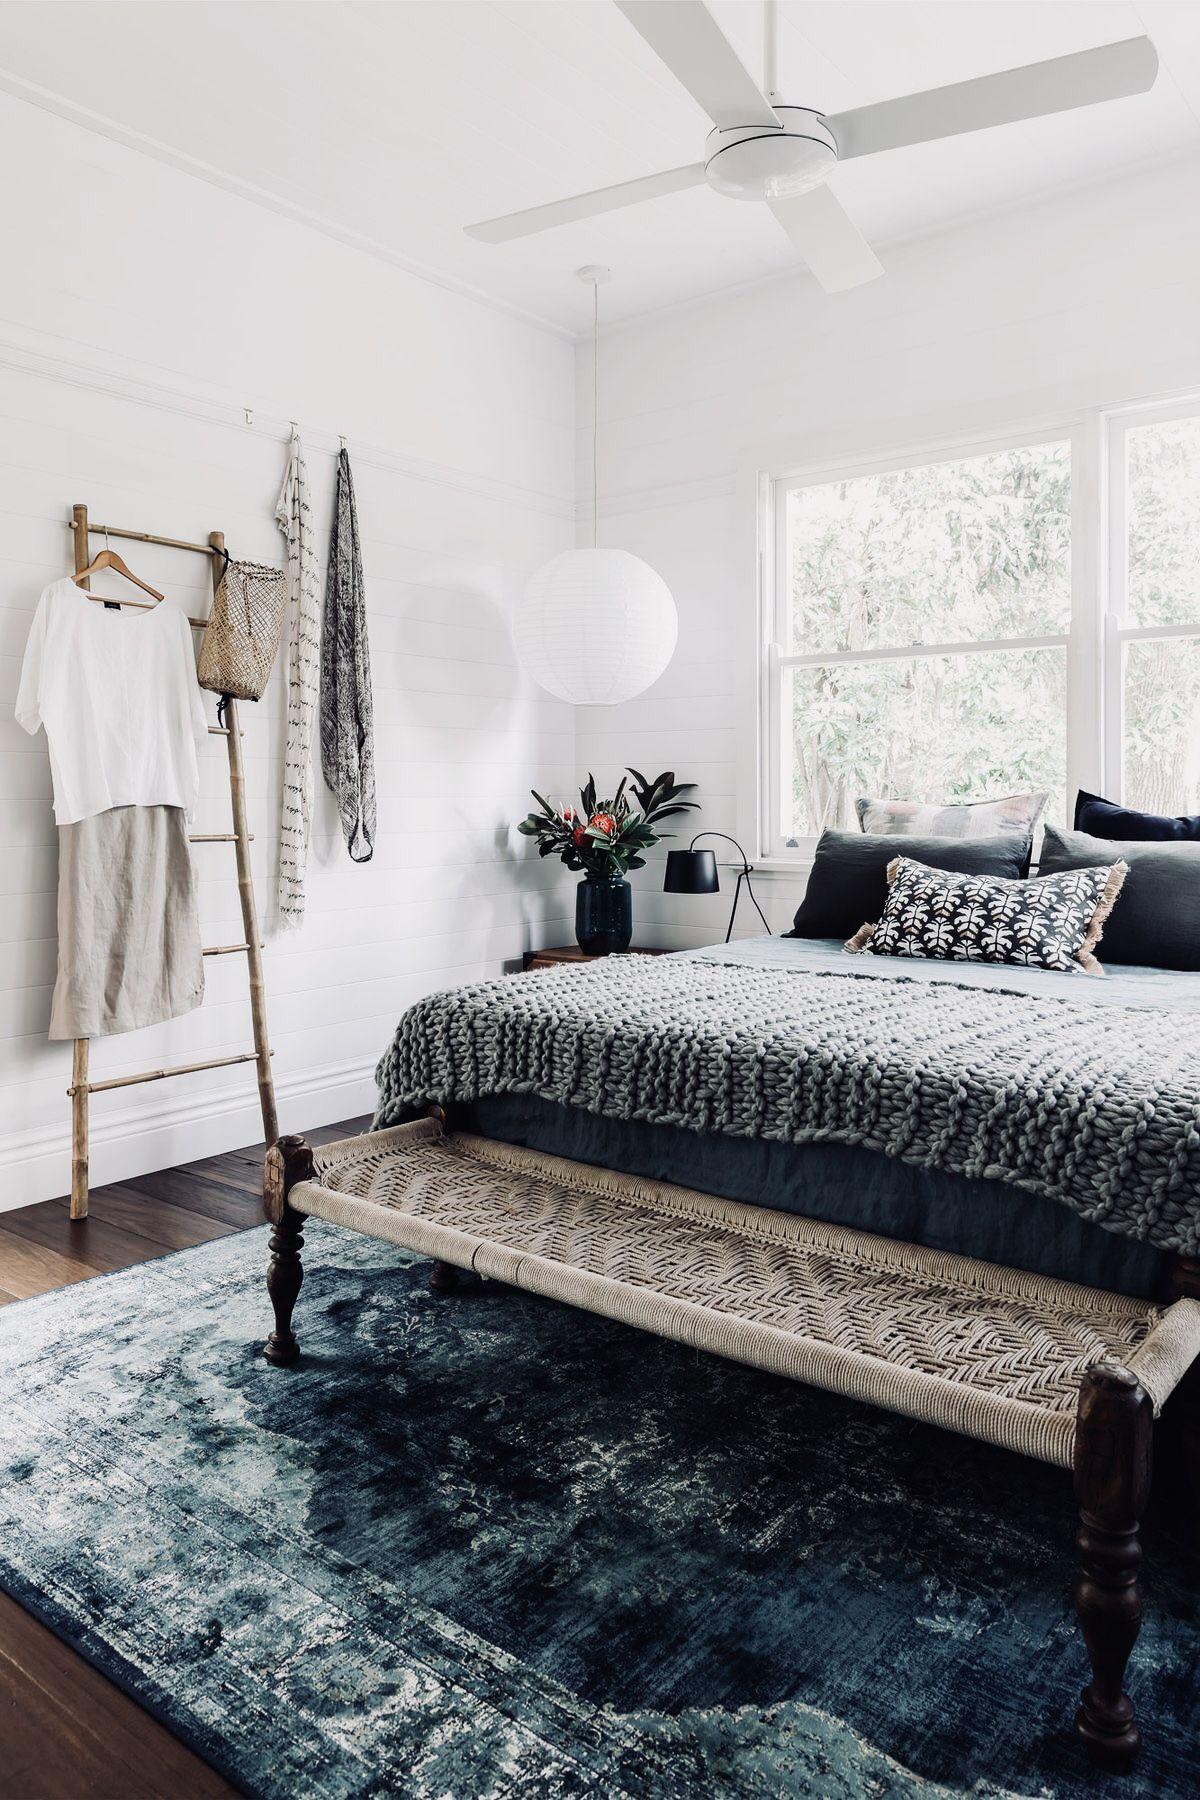 Pin by markela konstantinidou on interiors pinterest bedrooms